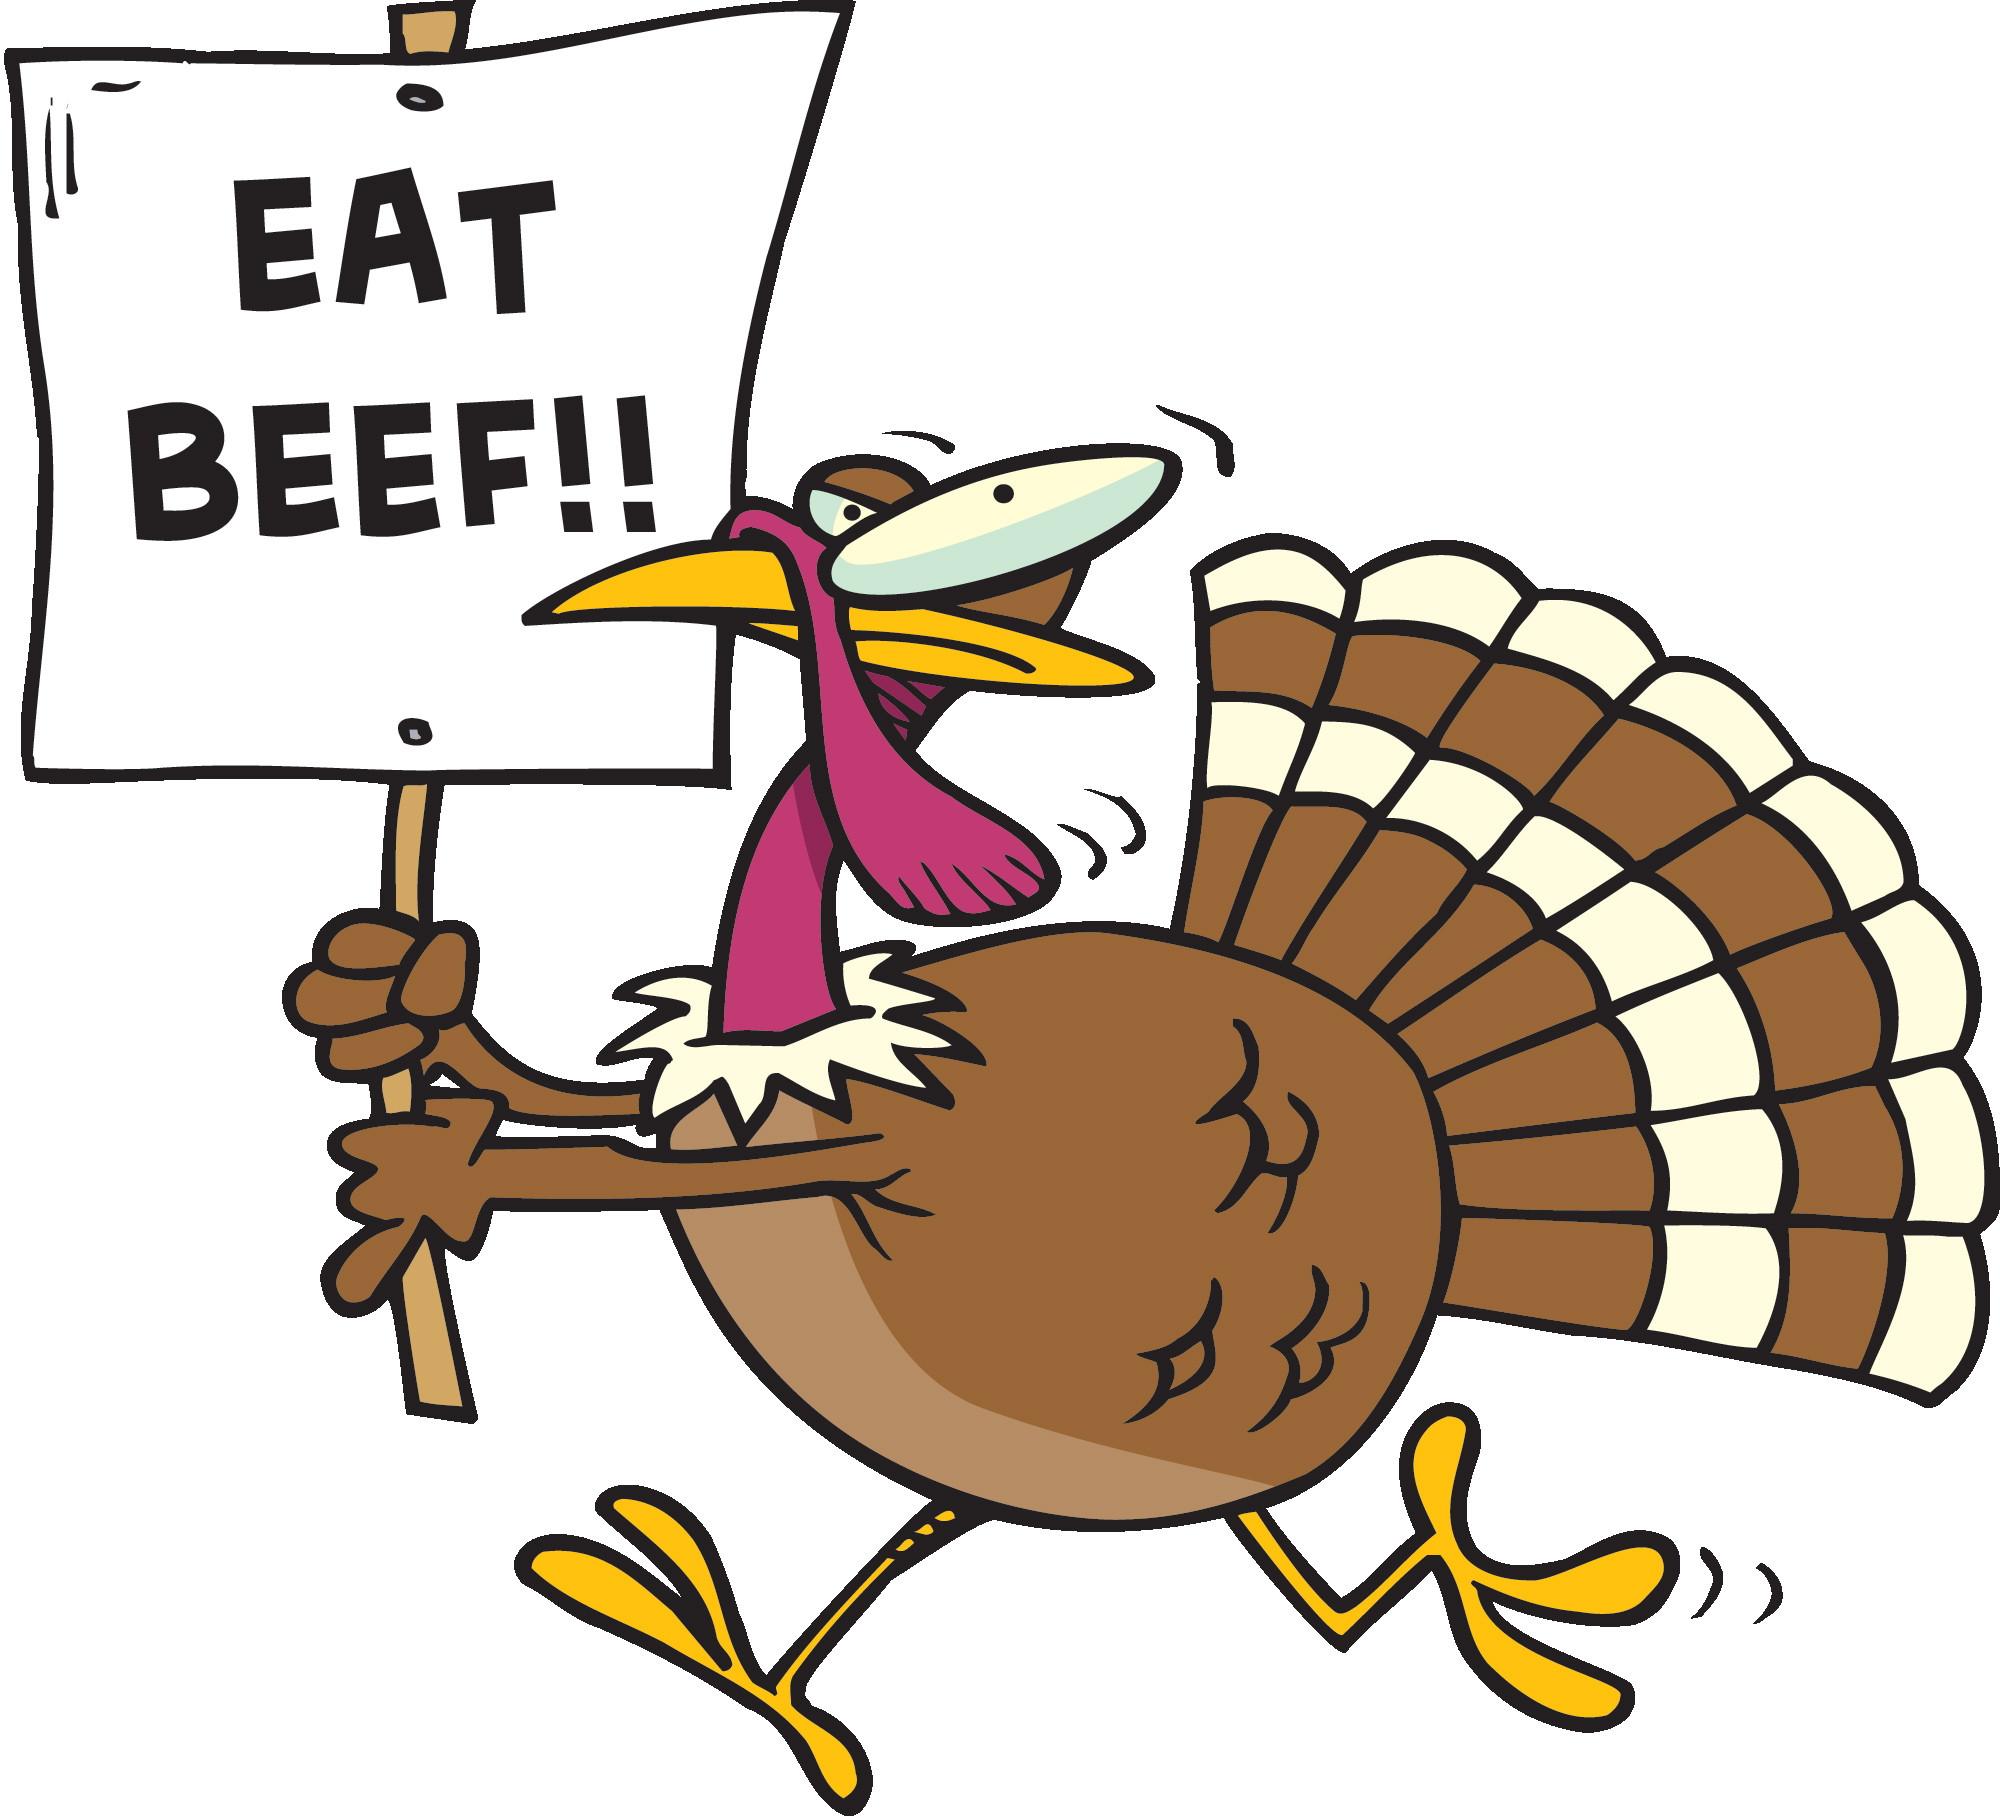 Thanksgiving Turkey Art  Eat Beef Funny Turkey Clipart Image